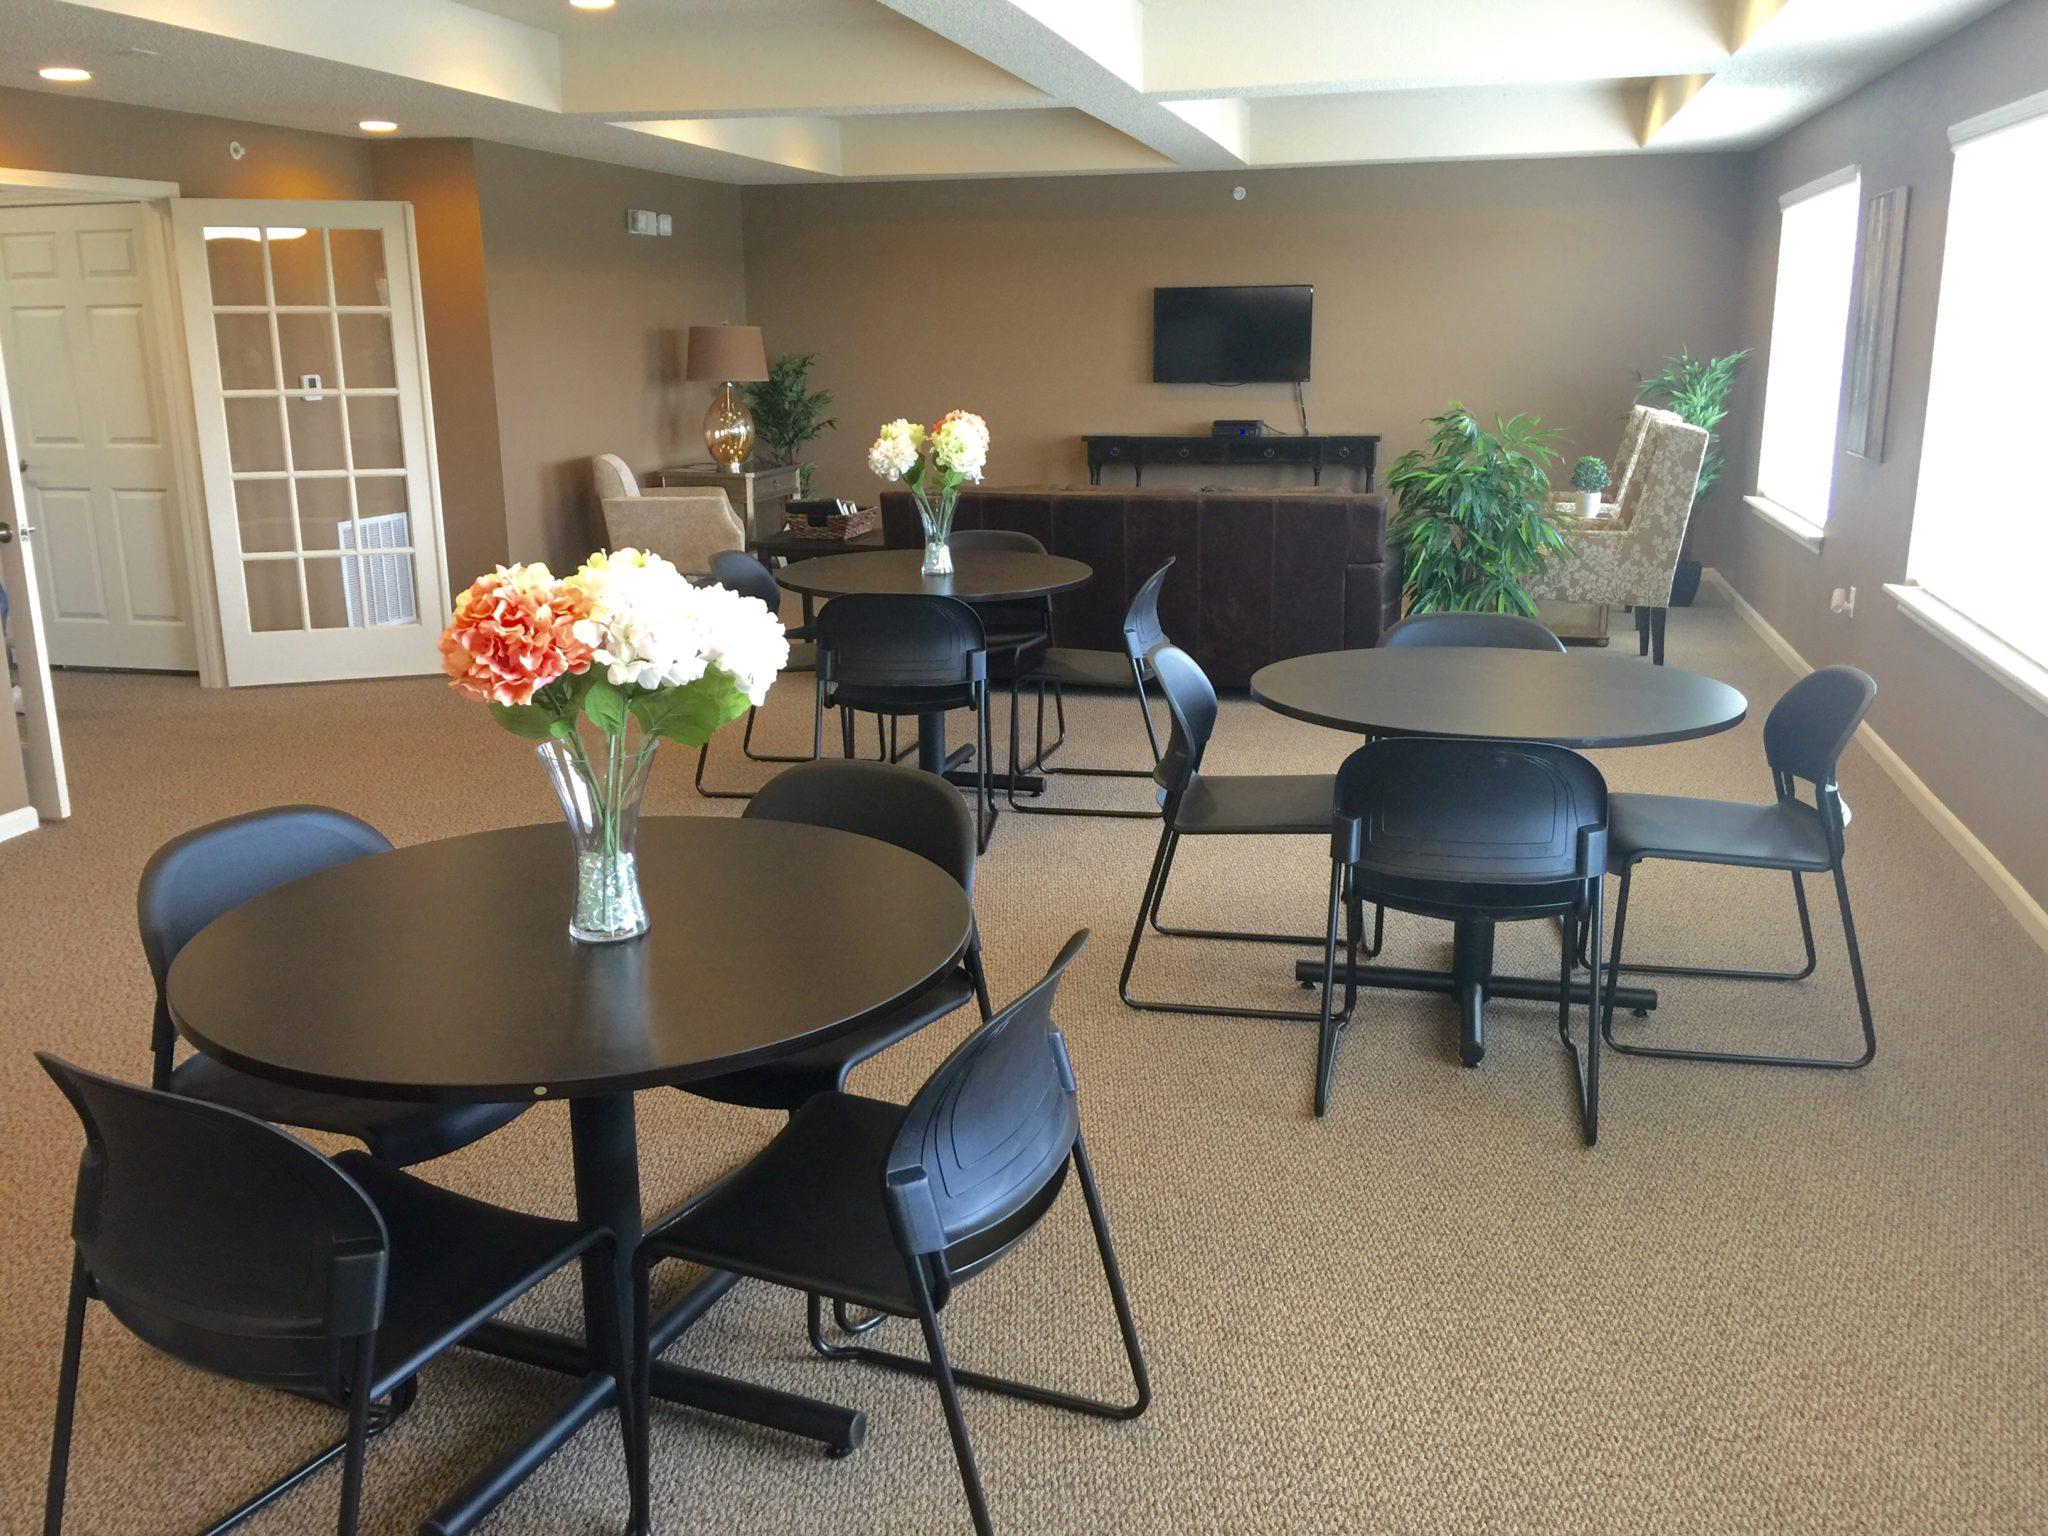 Briar Community Room II